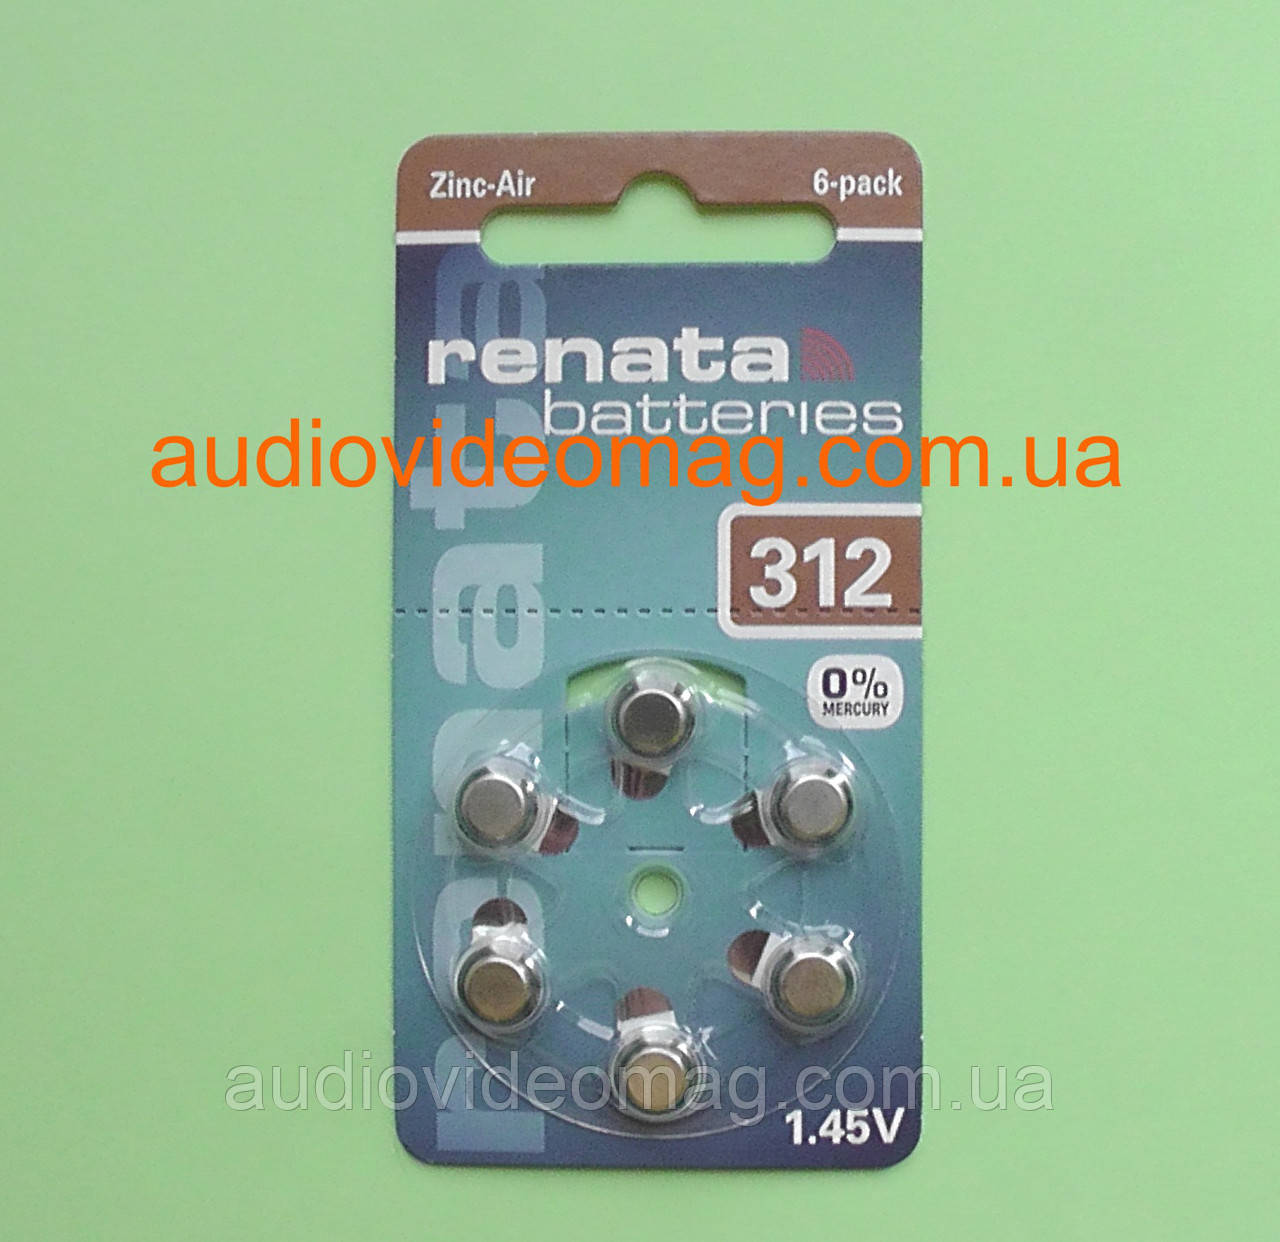 Батарейка Renata ZA 312 (PR41) для слуховых аппаратов. Цена за упаковку